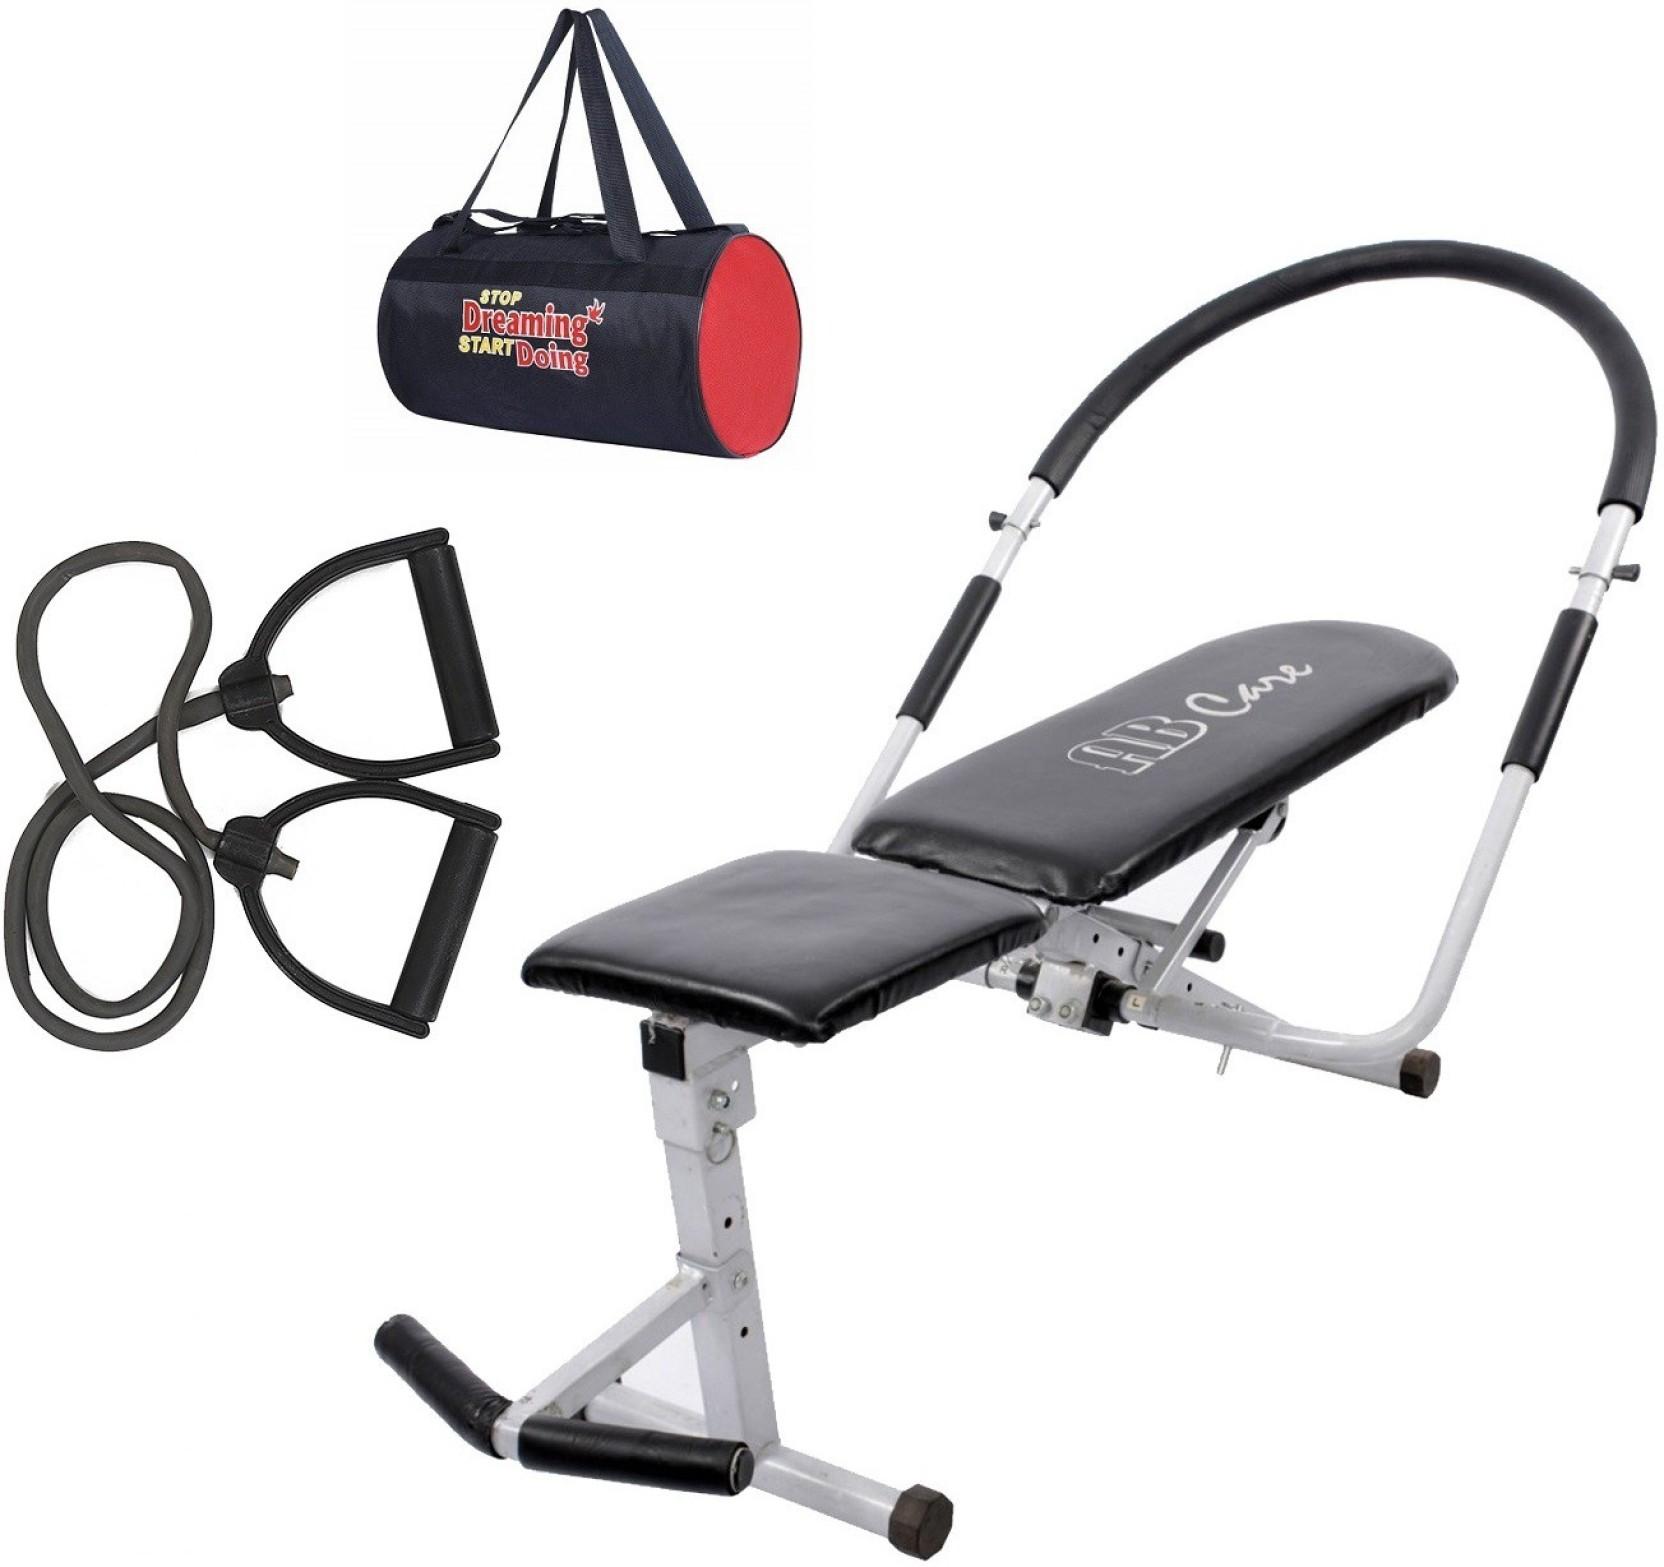 3507695d5544 Lifeline Ab Care Bench 111 Bonus with Gym Bag and Resistance Band Home Gym  Combo (100 - 120 kg)